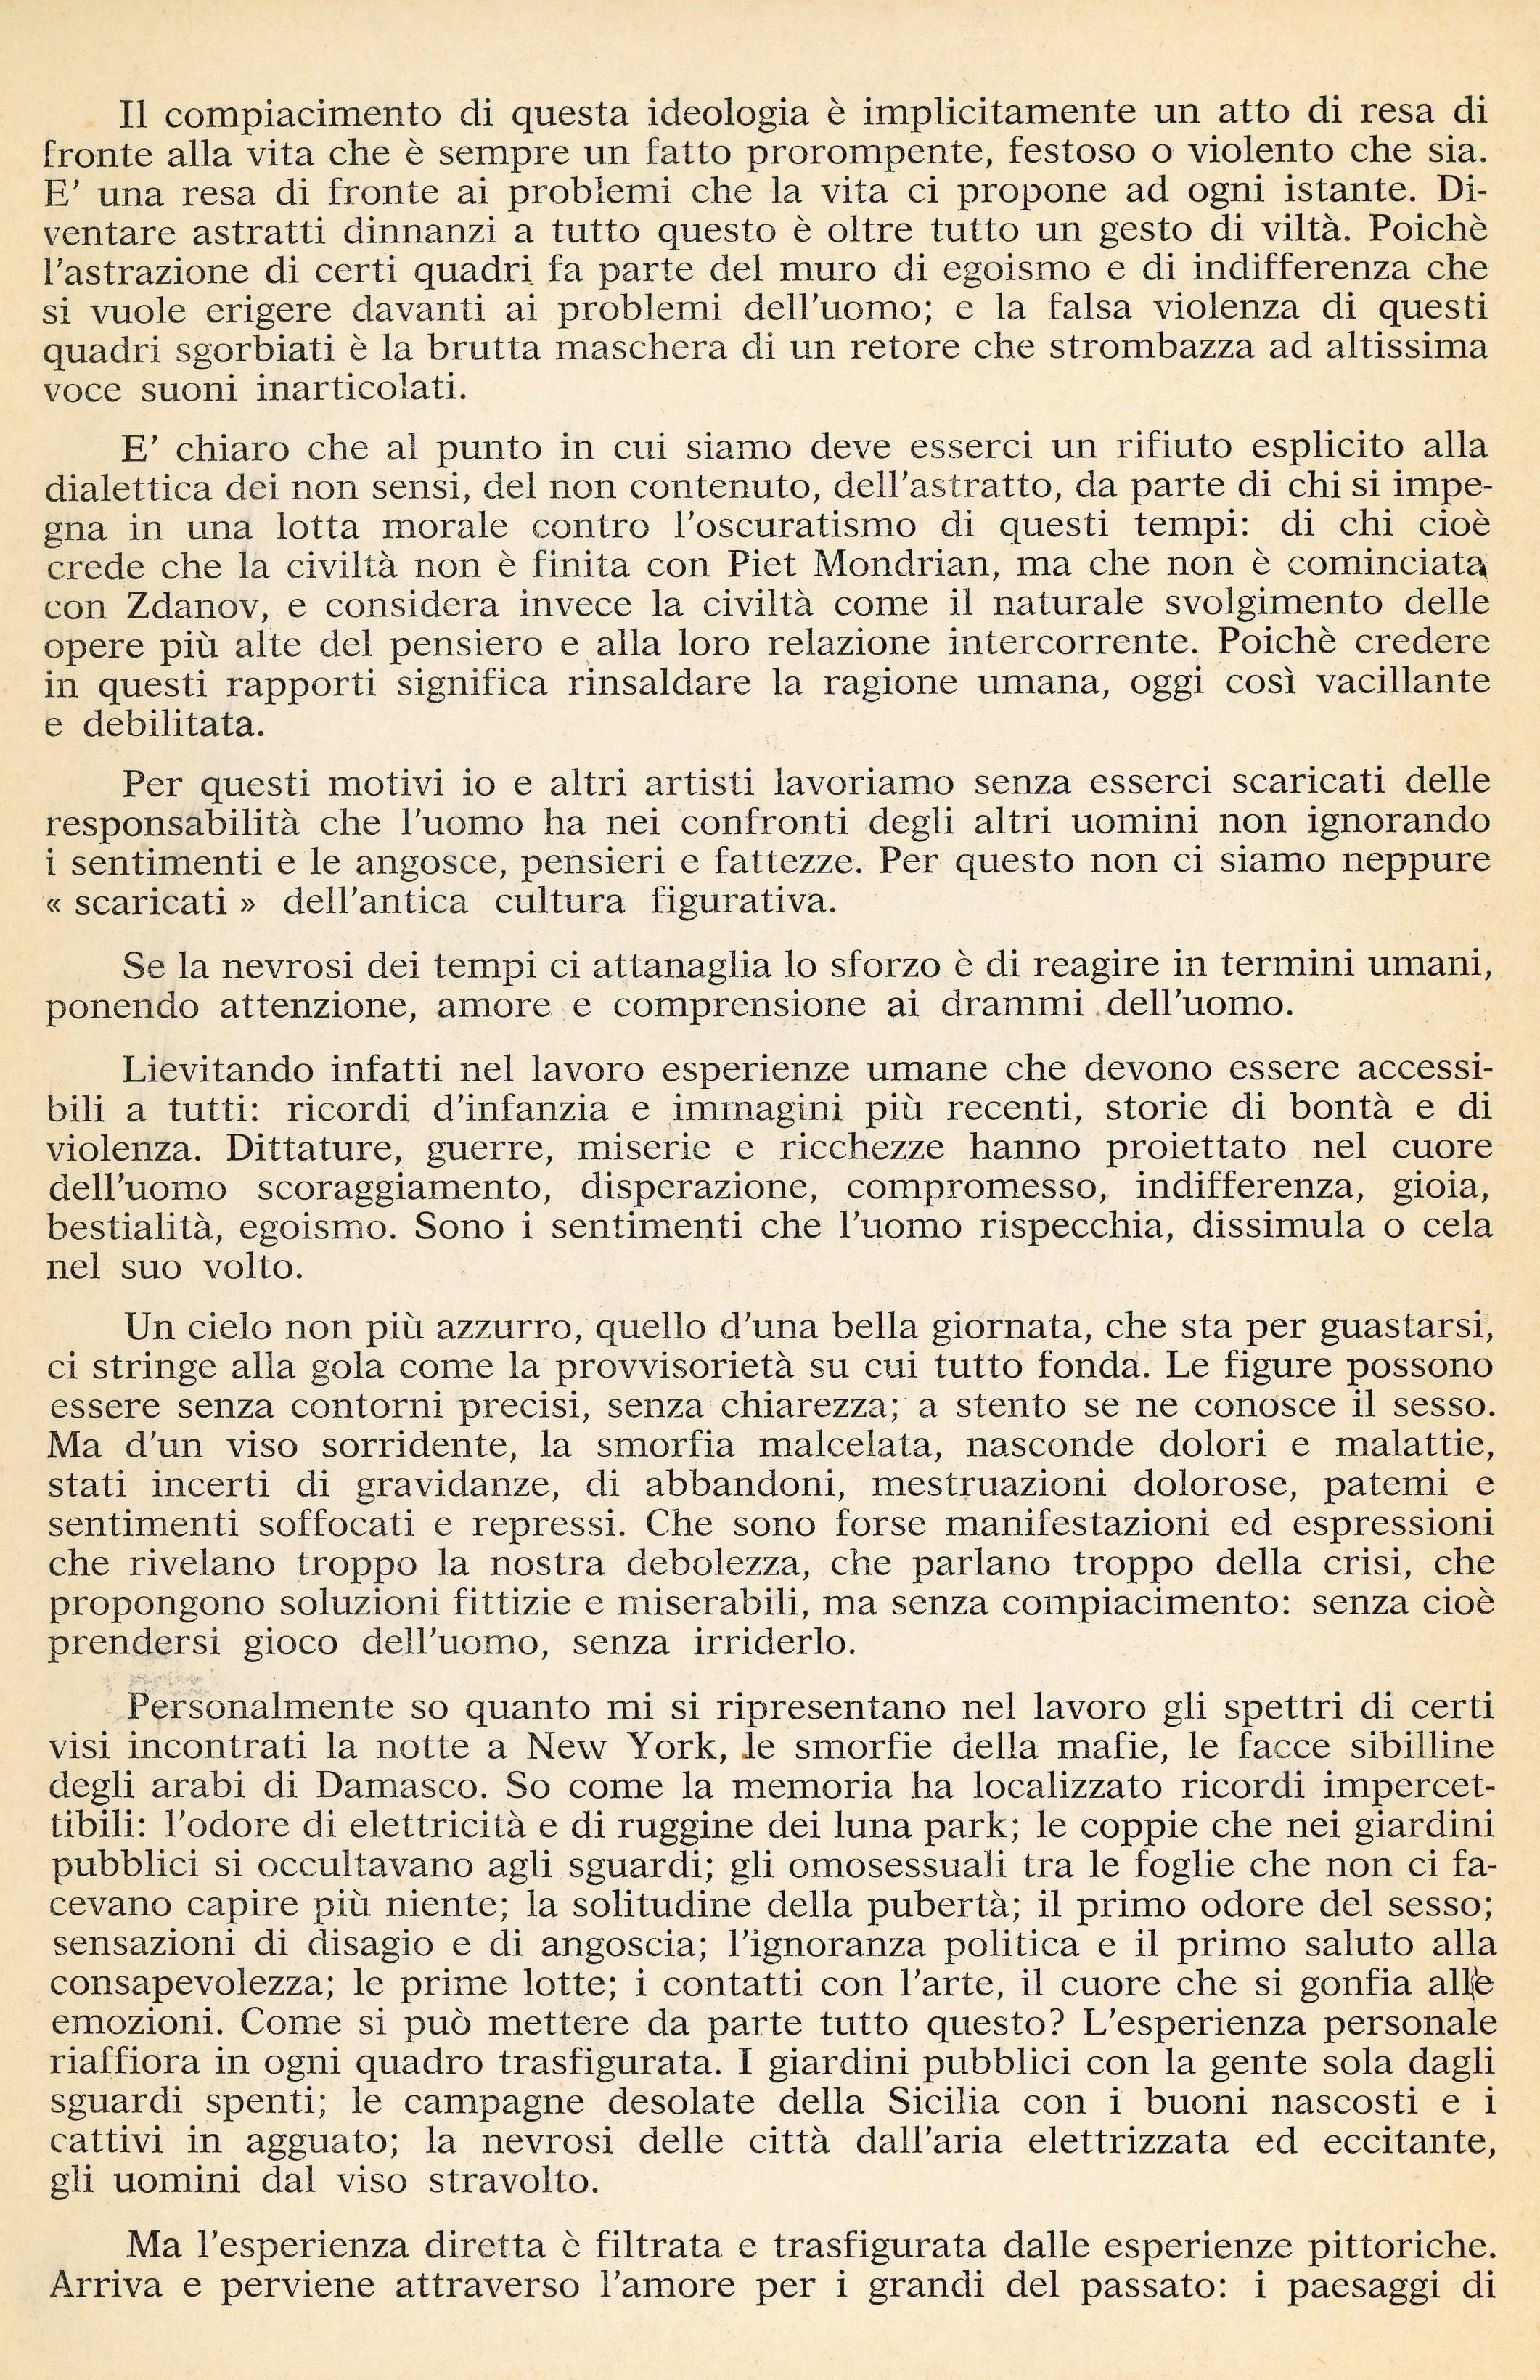 1964-05 Galleria Bigoni - Bruno Caruso_03.jpg